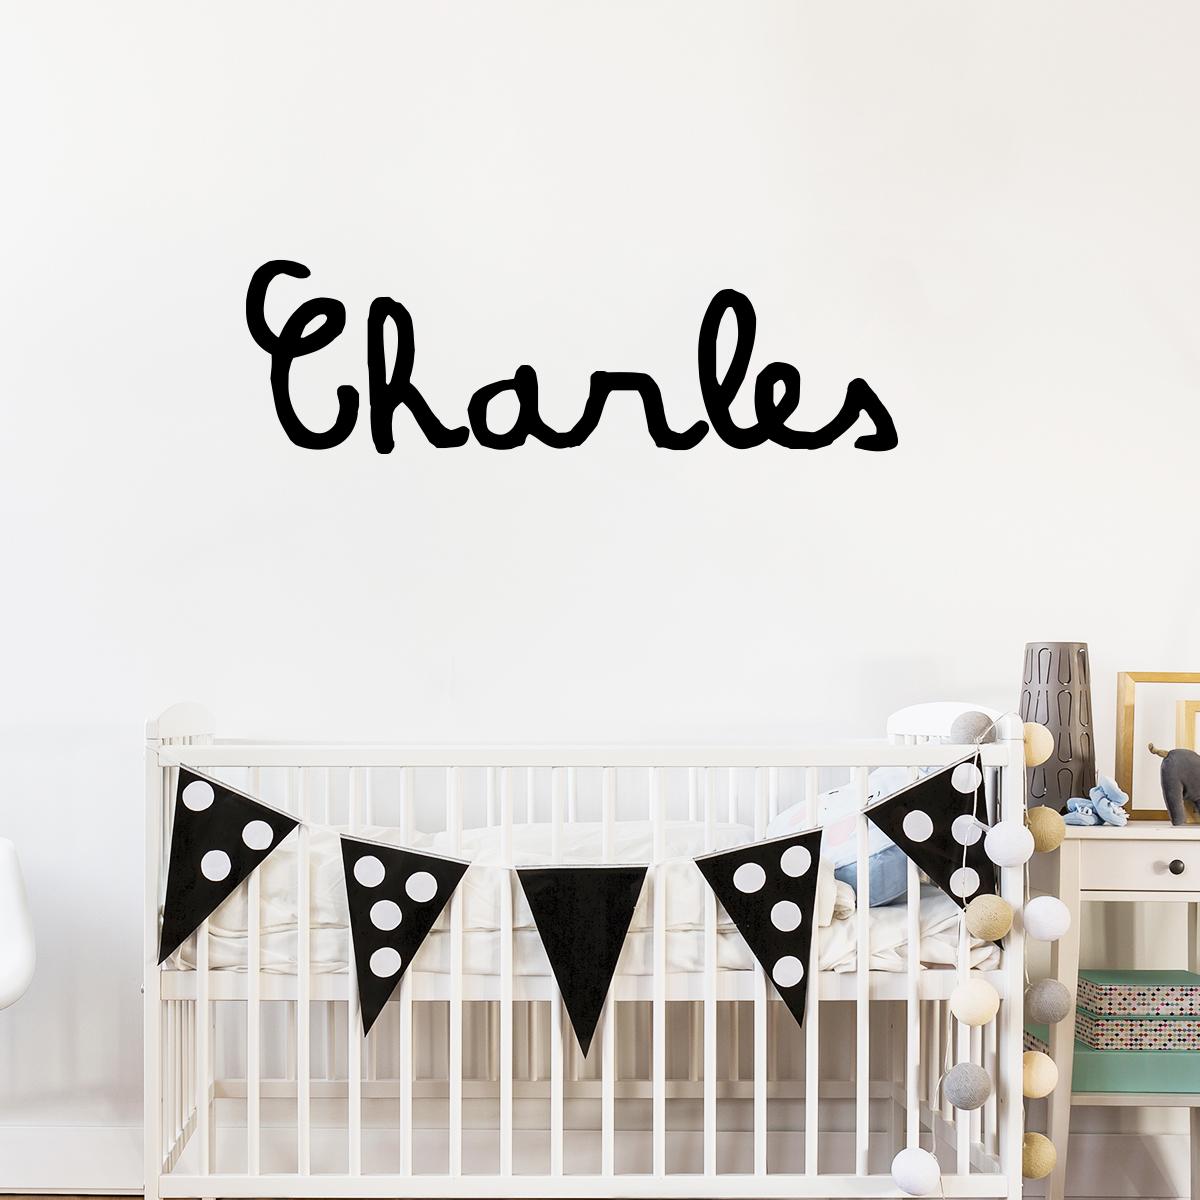 sticker pr nom personnalisable scolaire amusant stickers. Black Bedroom Furniture Sets. Home Design Ideas